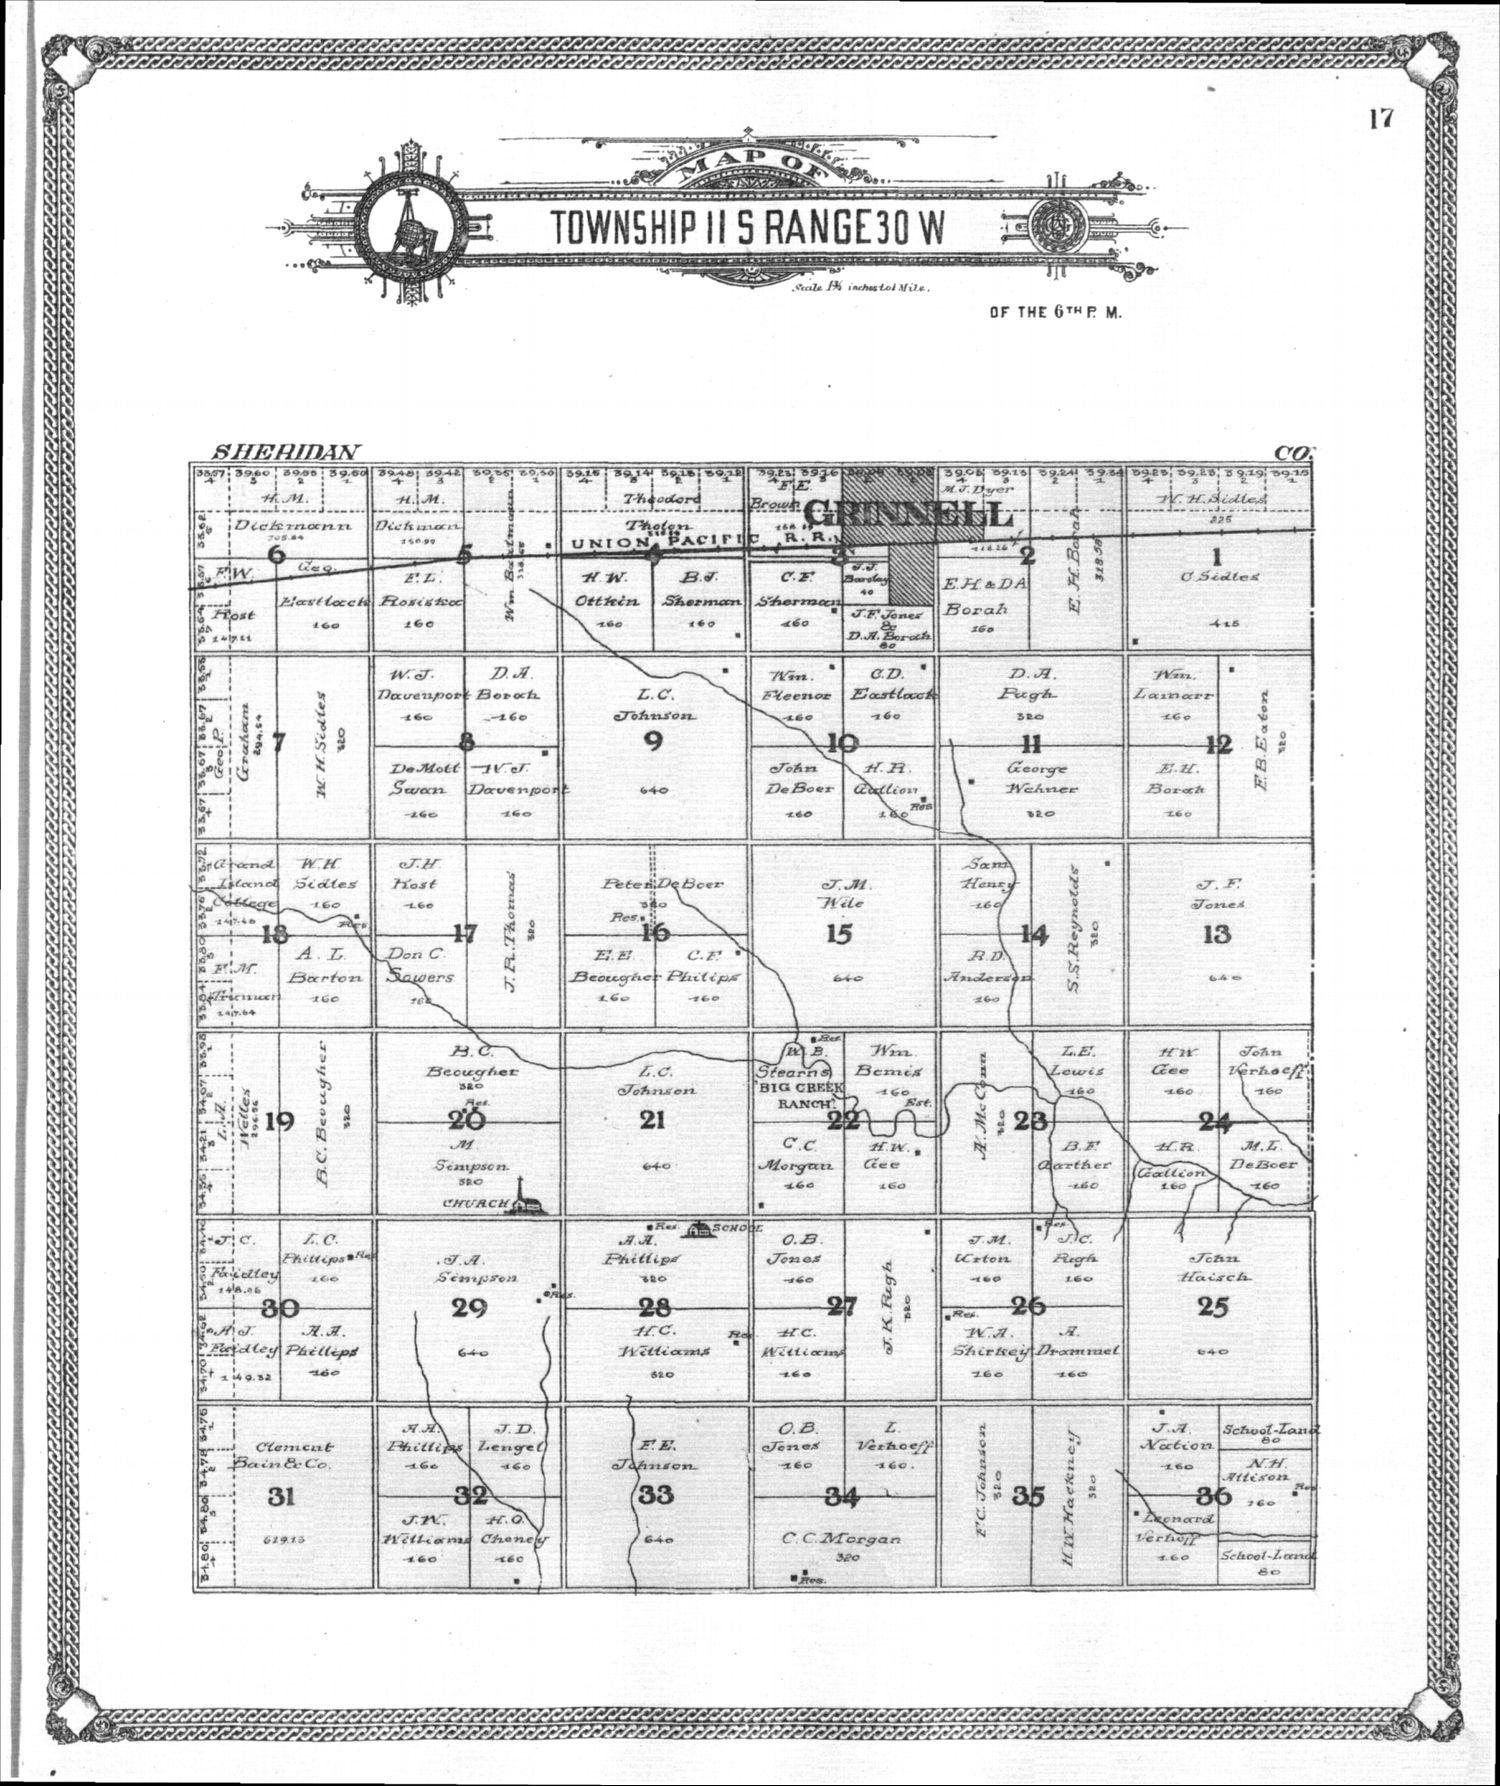 Standard atlas of Gove County, Kansas - 17